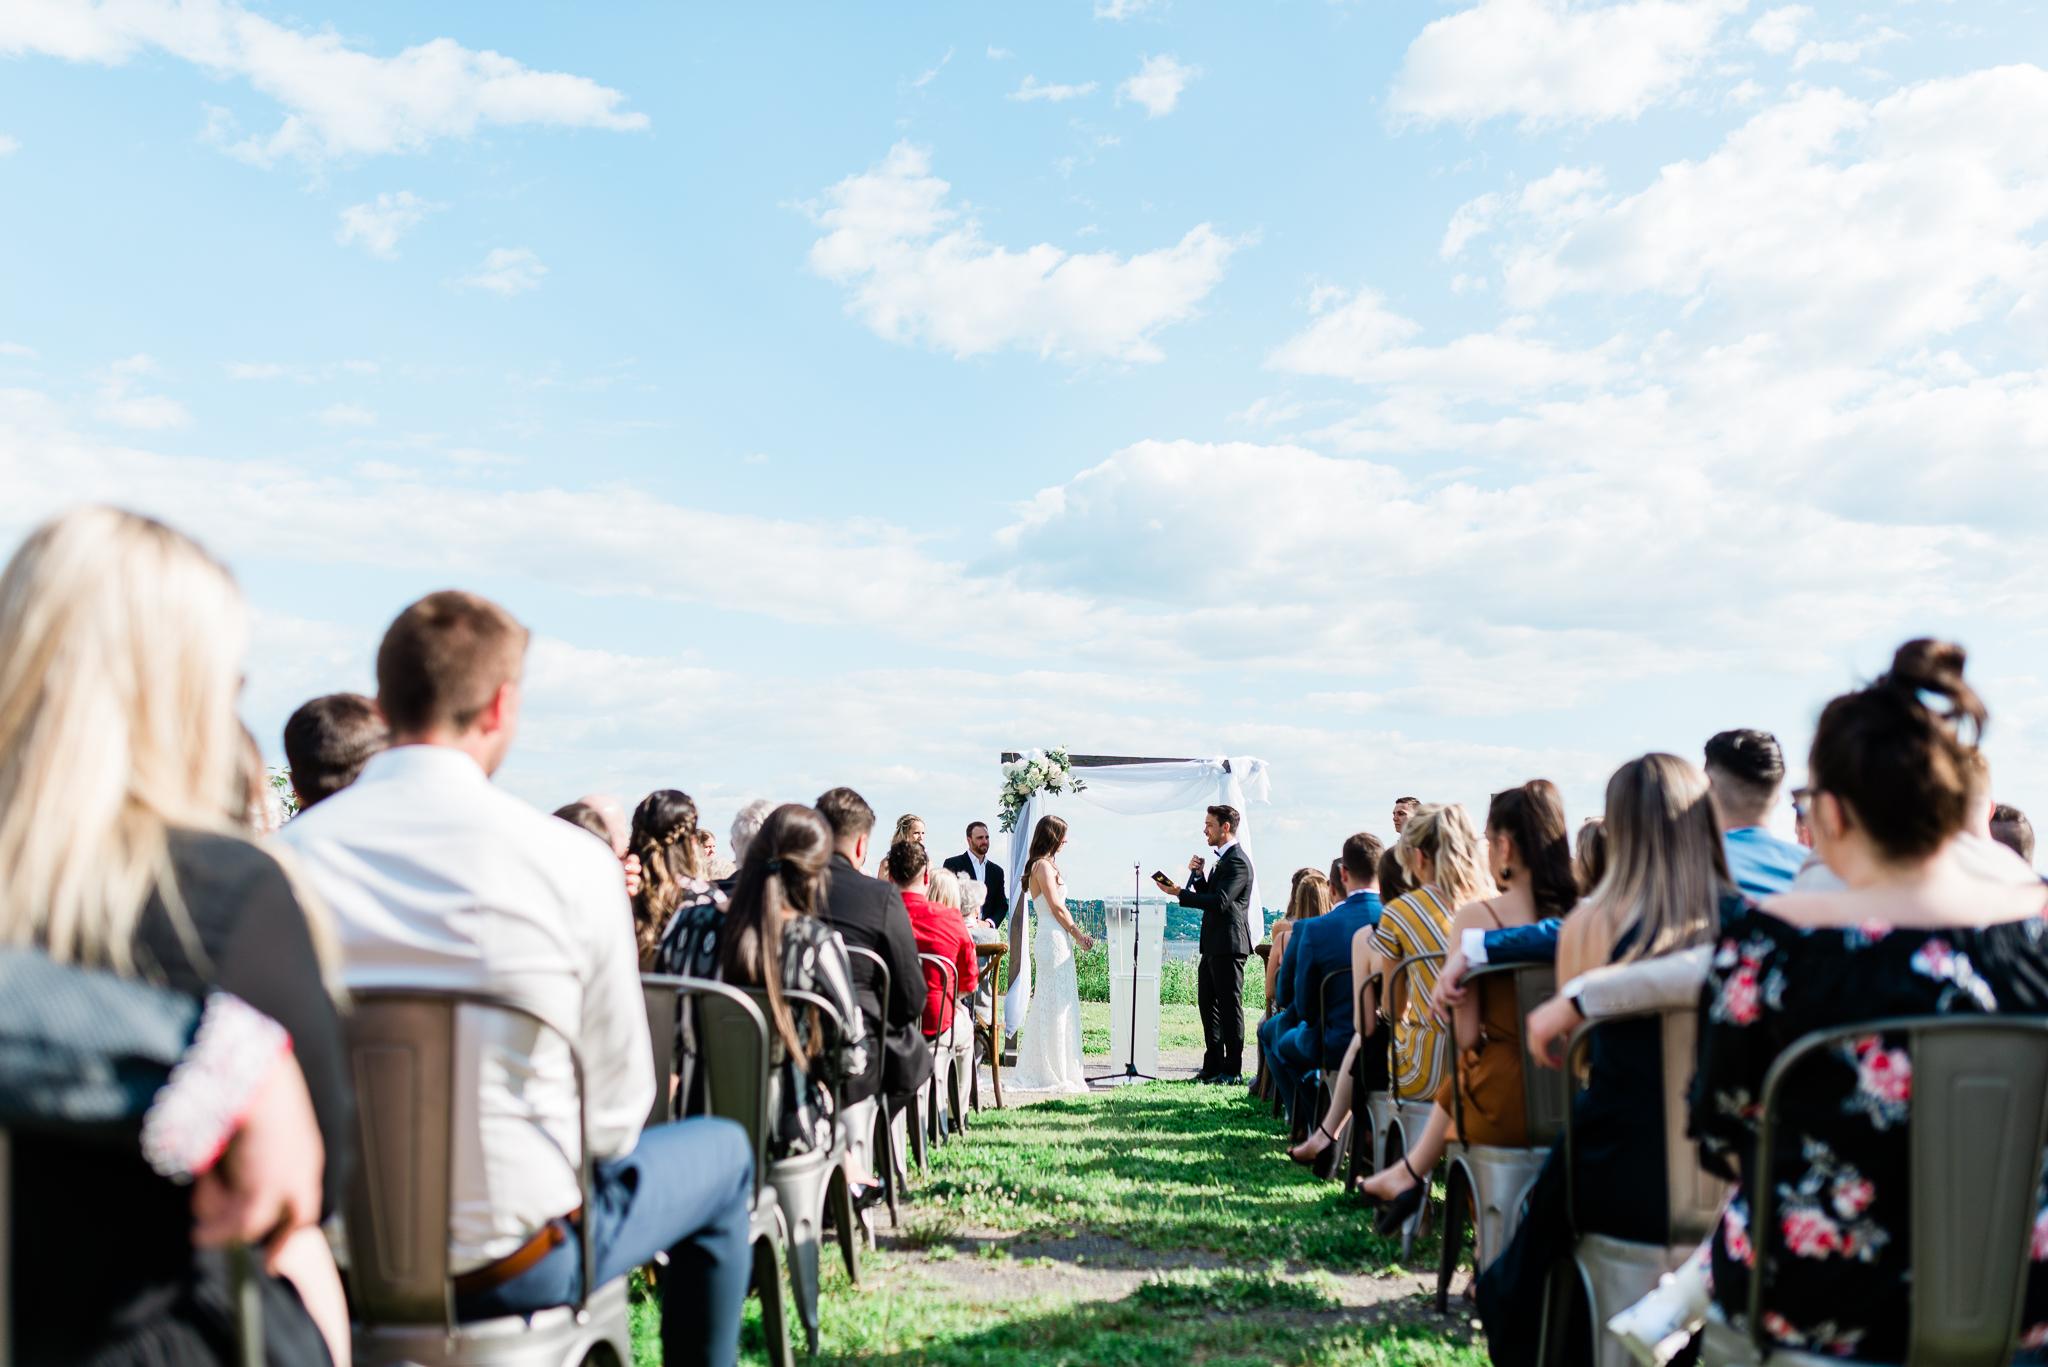 photo mariage salle du quai cap blanc quebec ceremonie toscane elisa photographe 3125 - MALYE + ANTHONY | Québec, Salle du Quai du Cap Blanc | Photographe de mariage | Elisa Photography